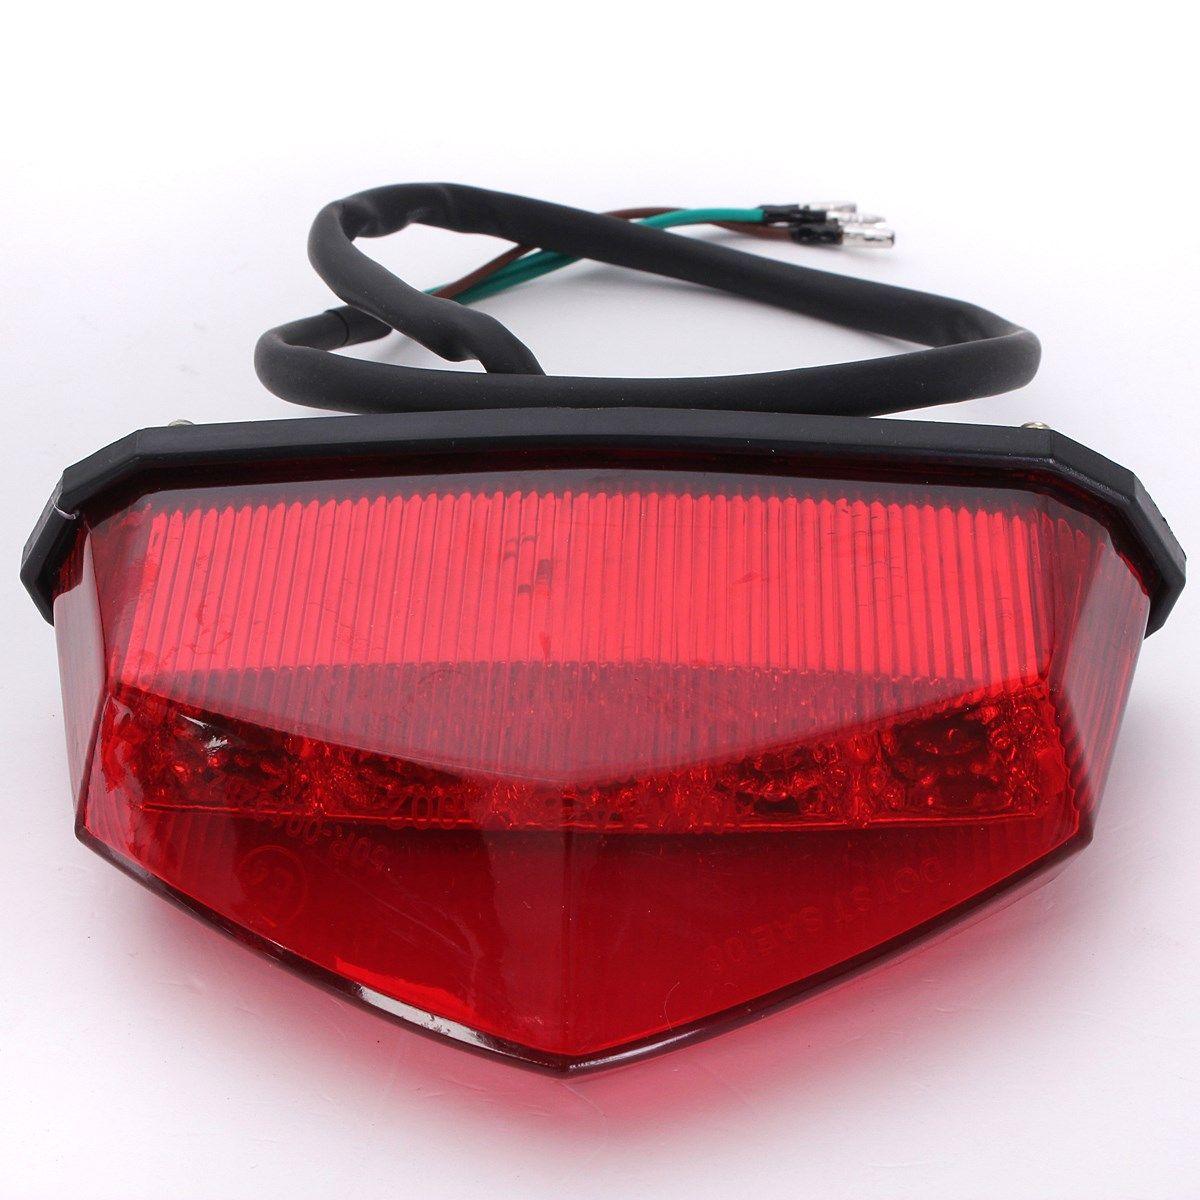 12V 3 Wiring Universal 10LEDs Red Motorcycle Dirt Bike Plate Lamp Rear Tail Brake  Light Motor Lamp Rear Light Led Light Online with $21.85/Piece on ...